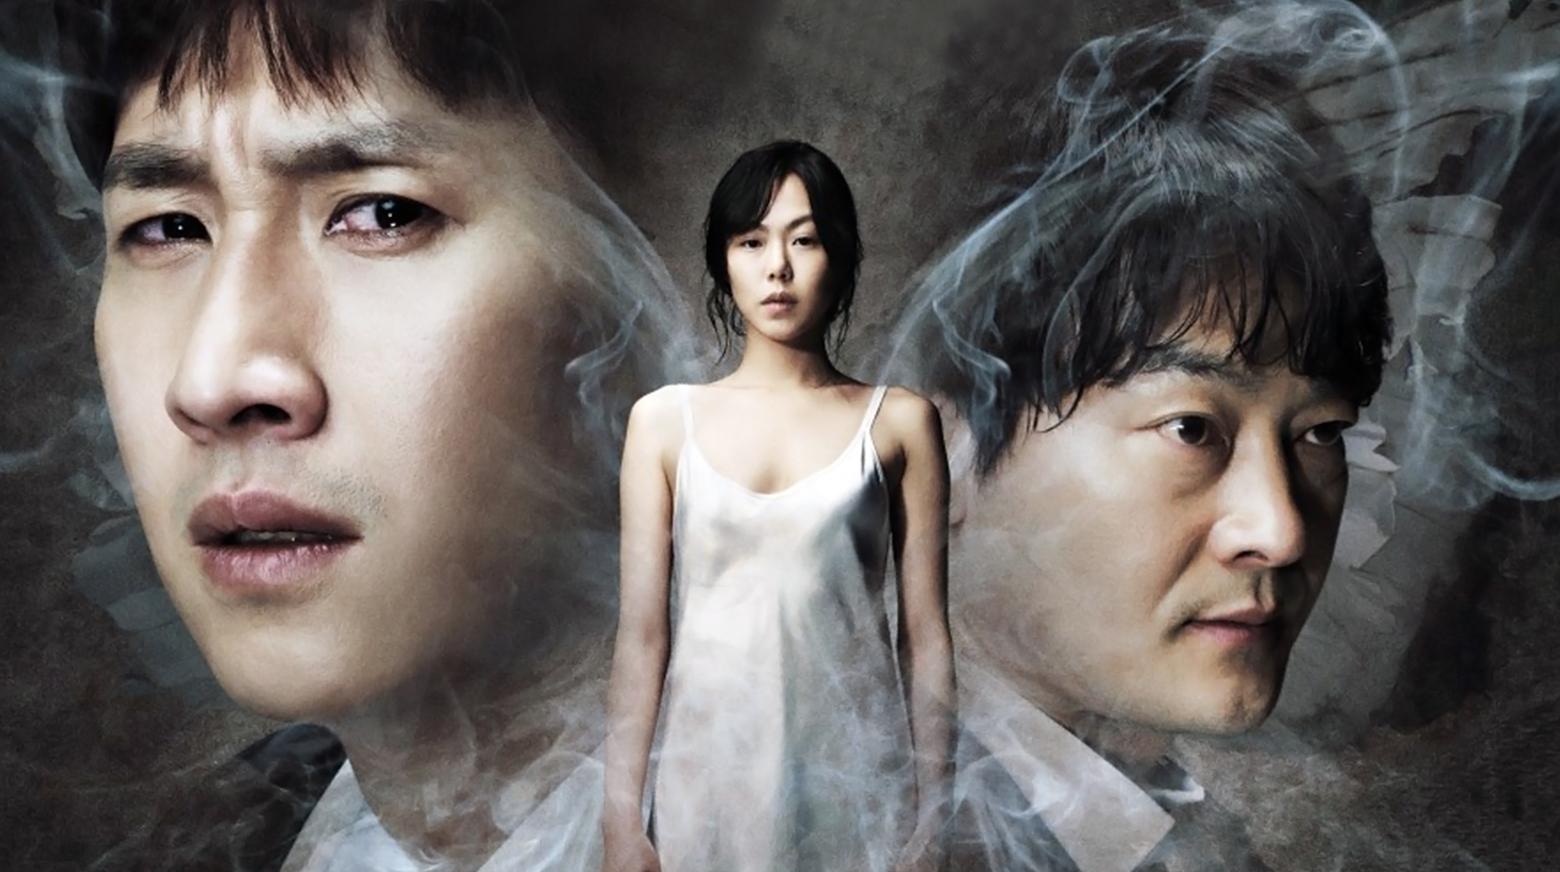 Helpless - 화차 - Watch Full Movie Free - Korea - Movie - Rakuten Viki